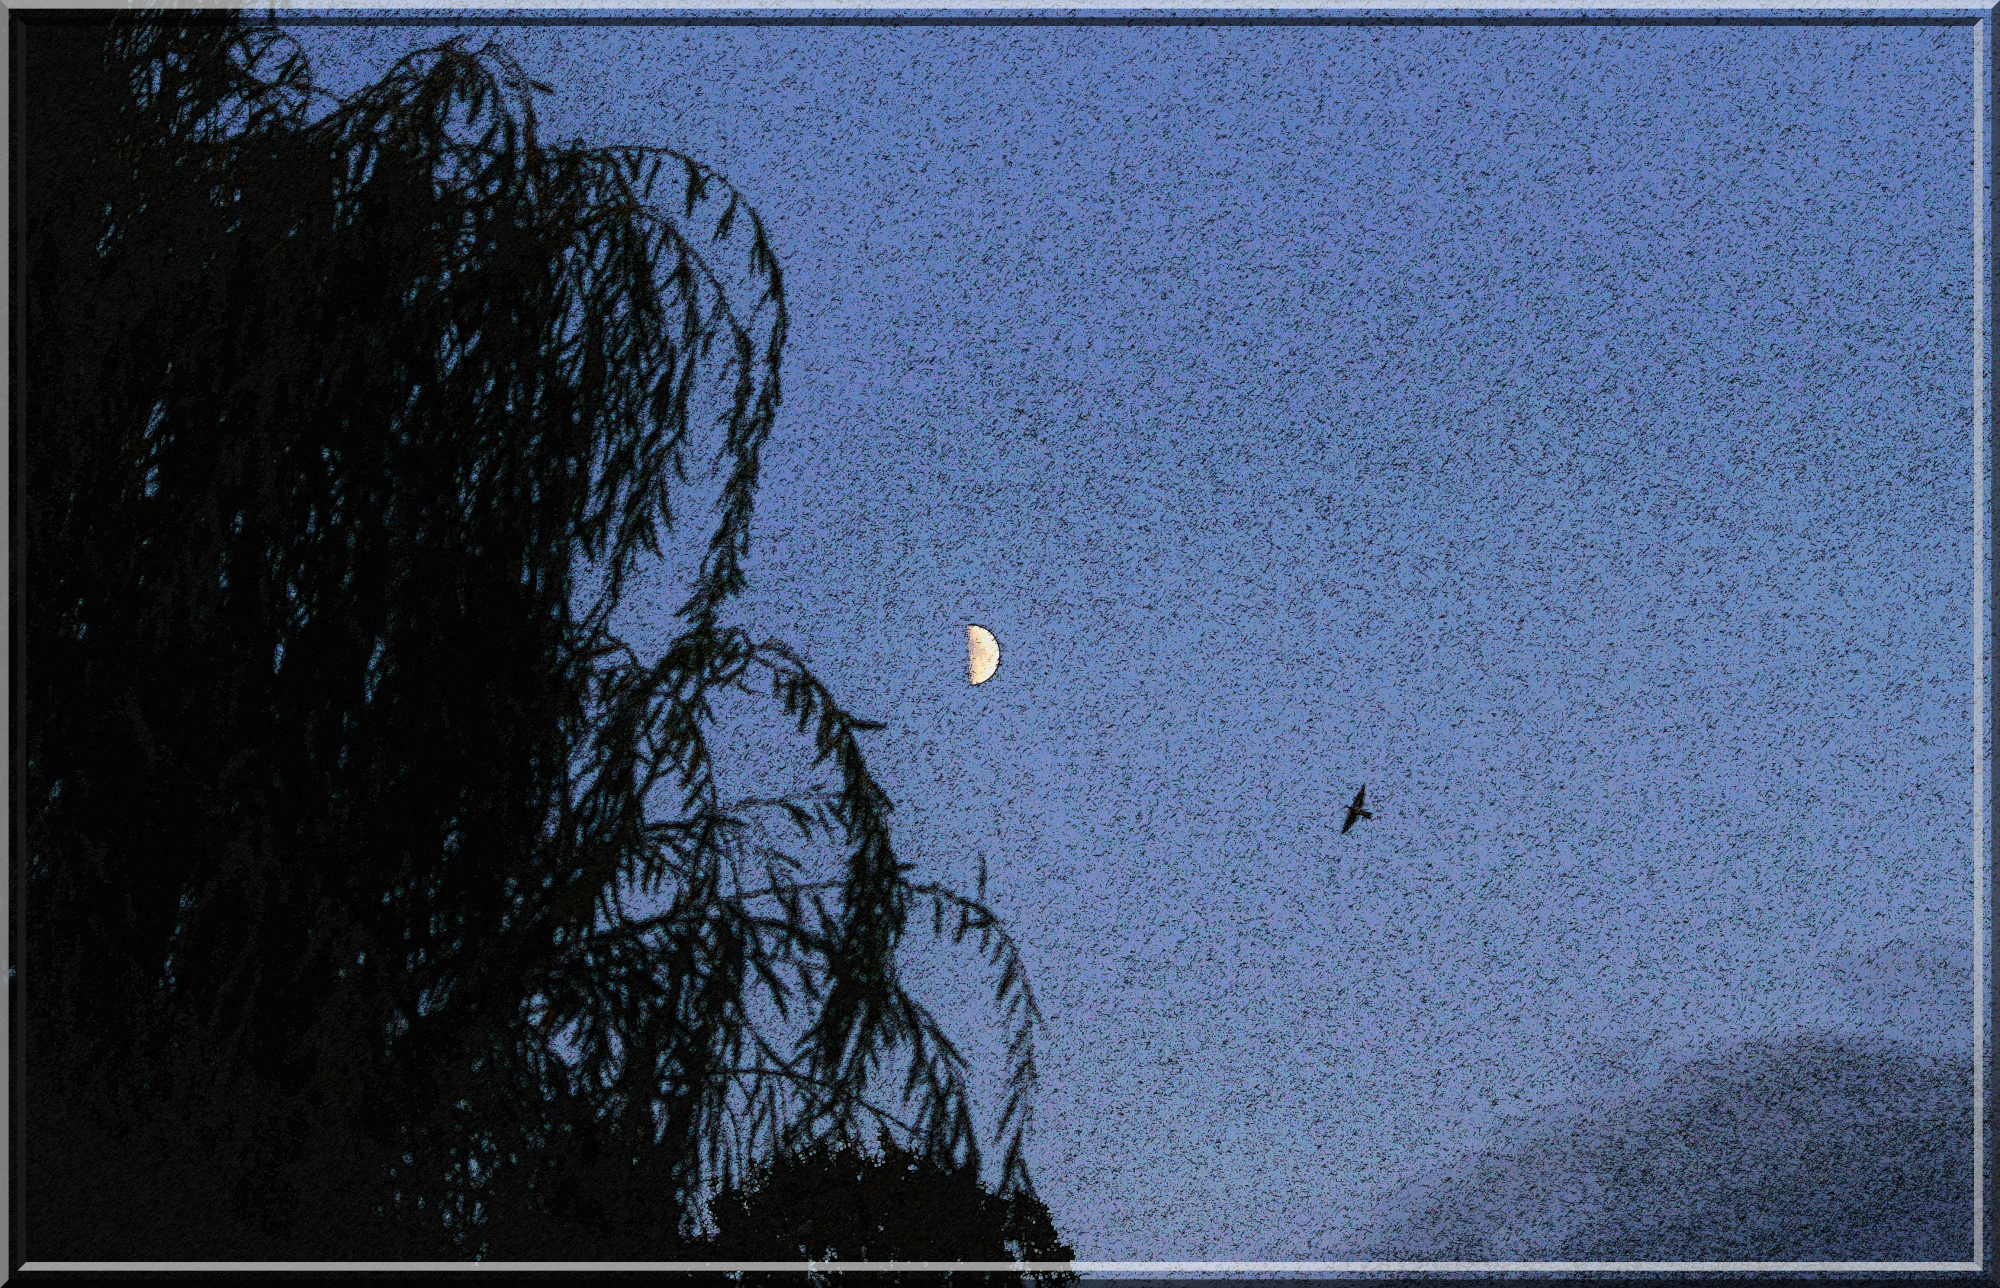 tableau_oiseau_BD.thumb.JPG.07a27067ca86870be018839f88e510c5.JPG